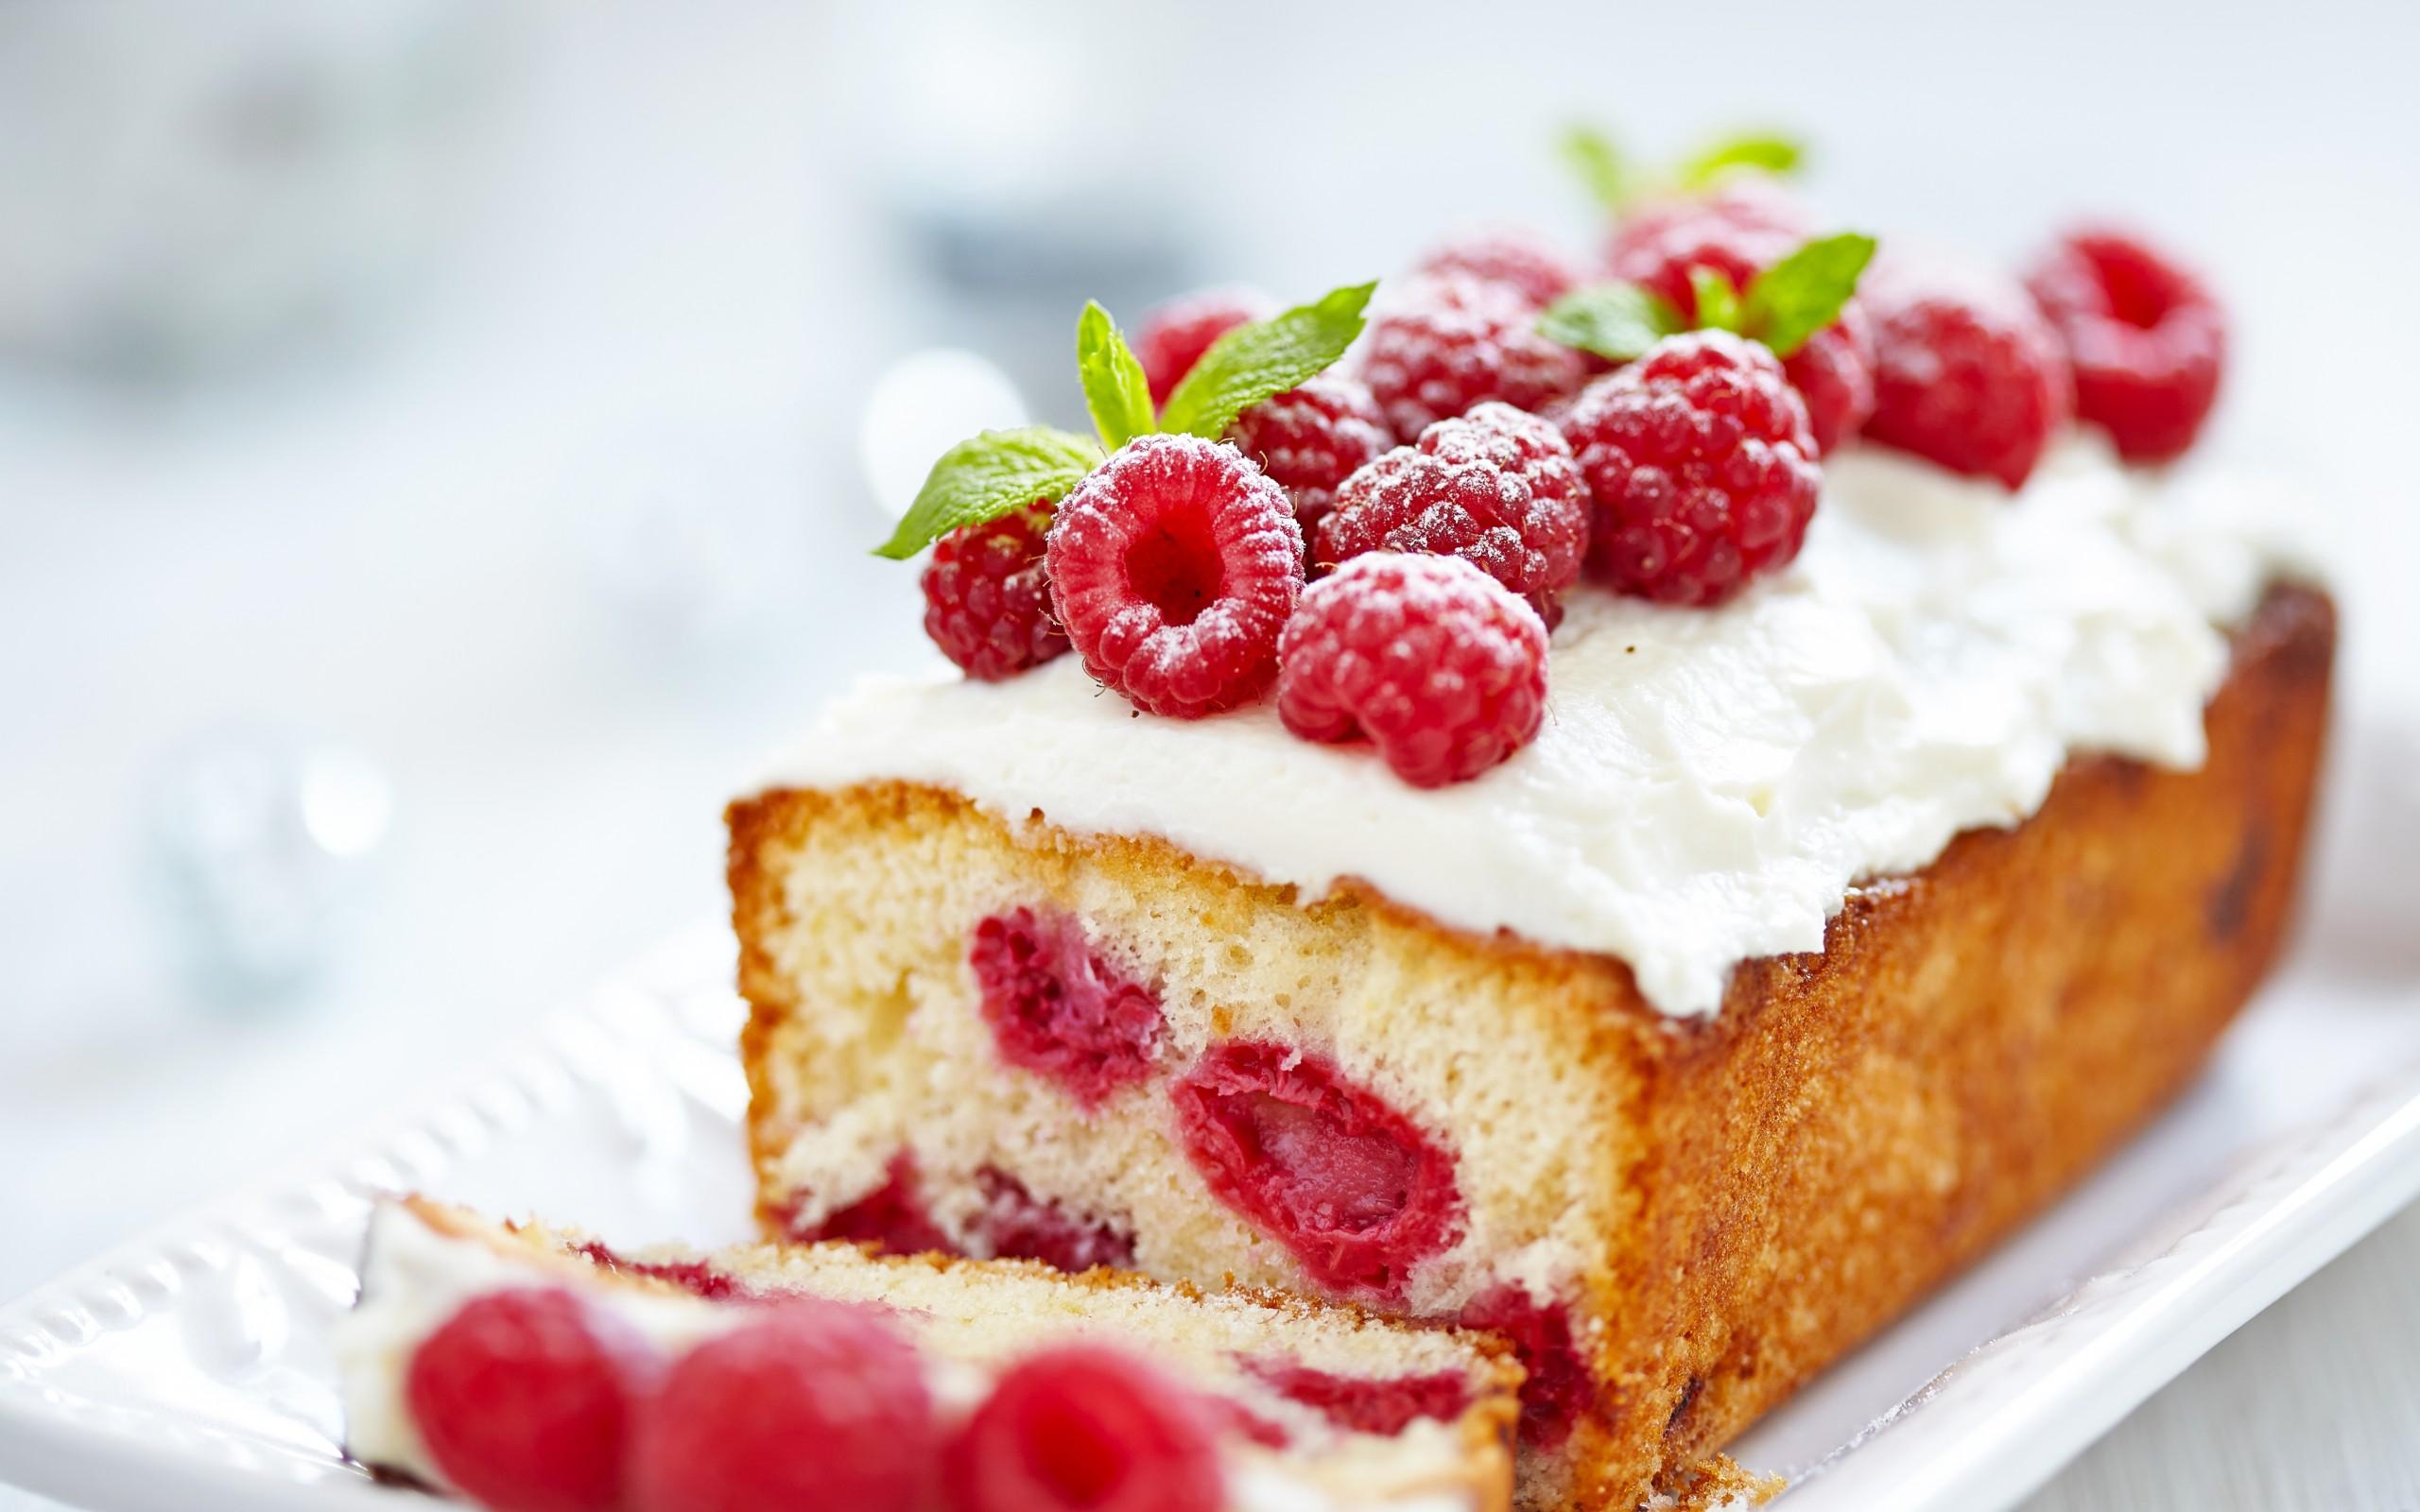 HQ Dessert Wallpapers   File 446.36Kb